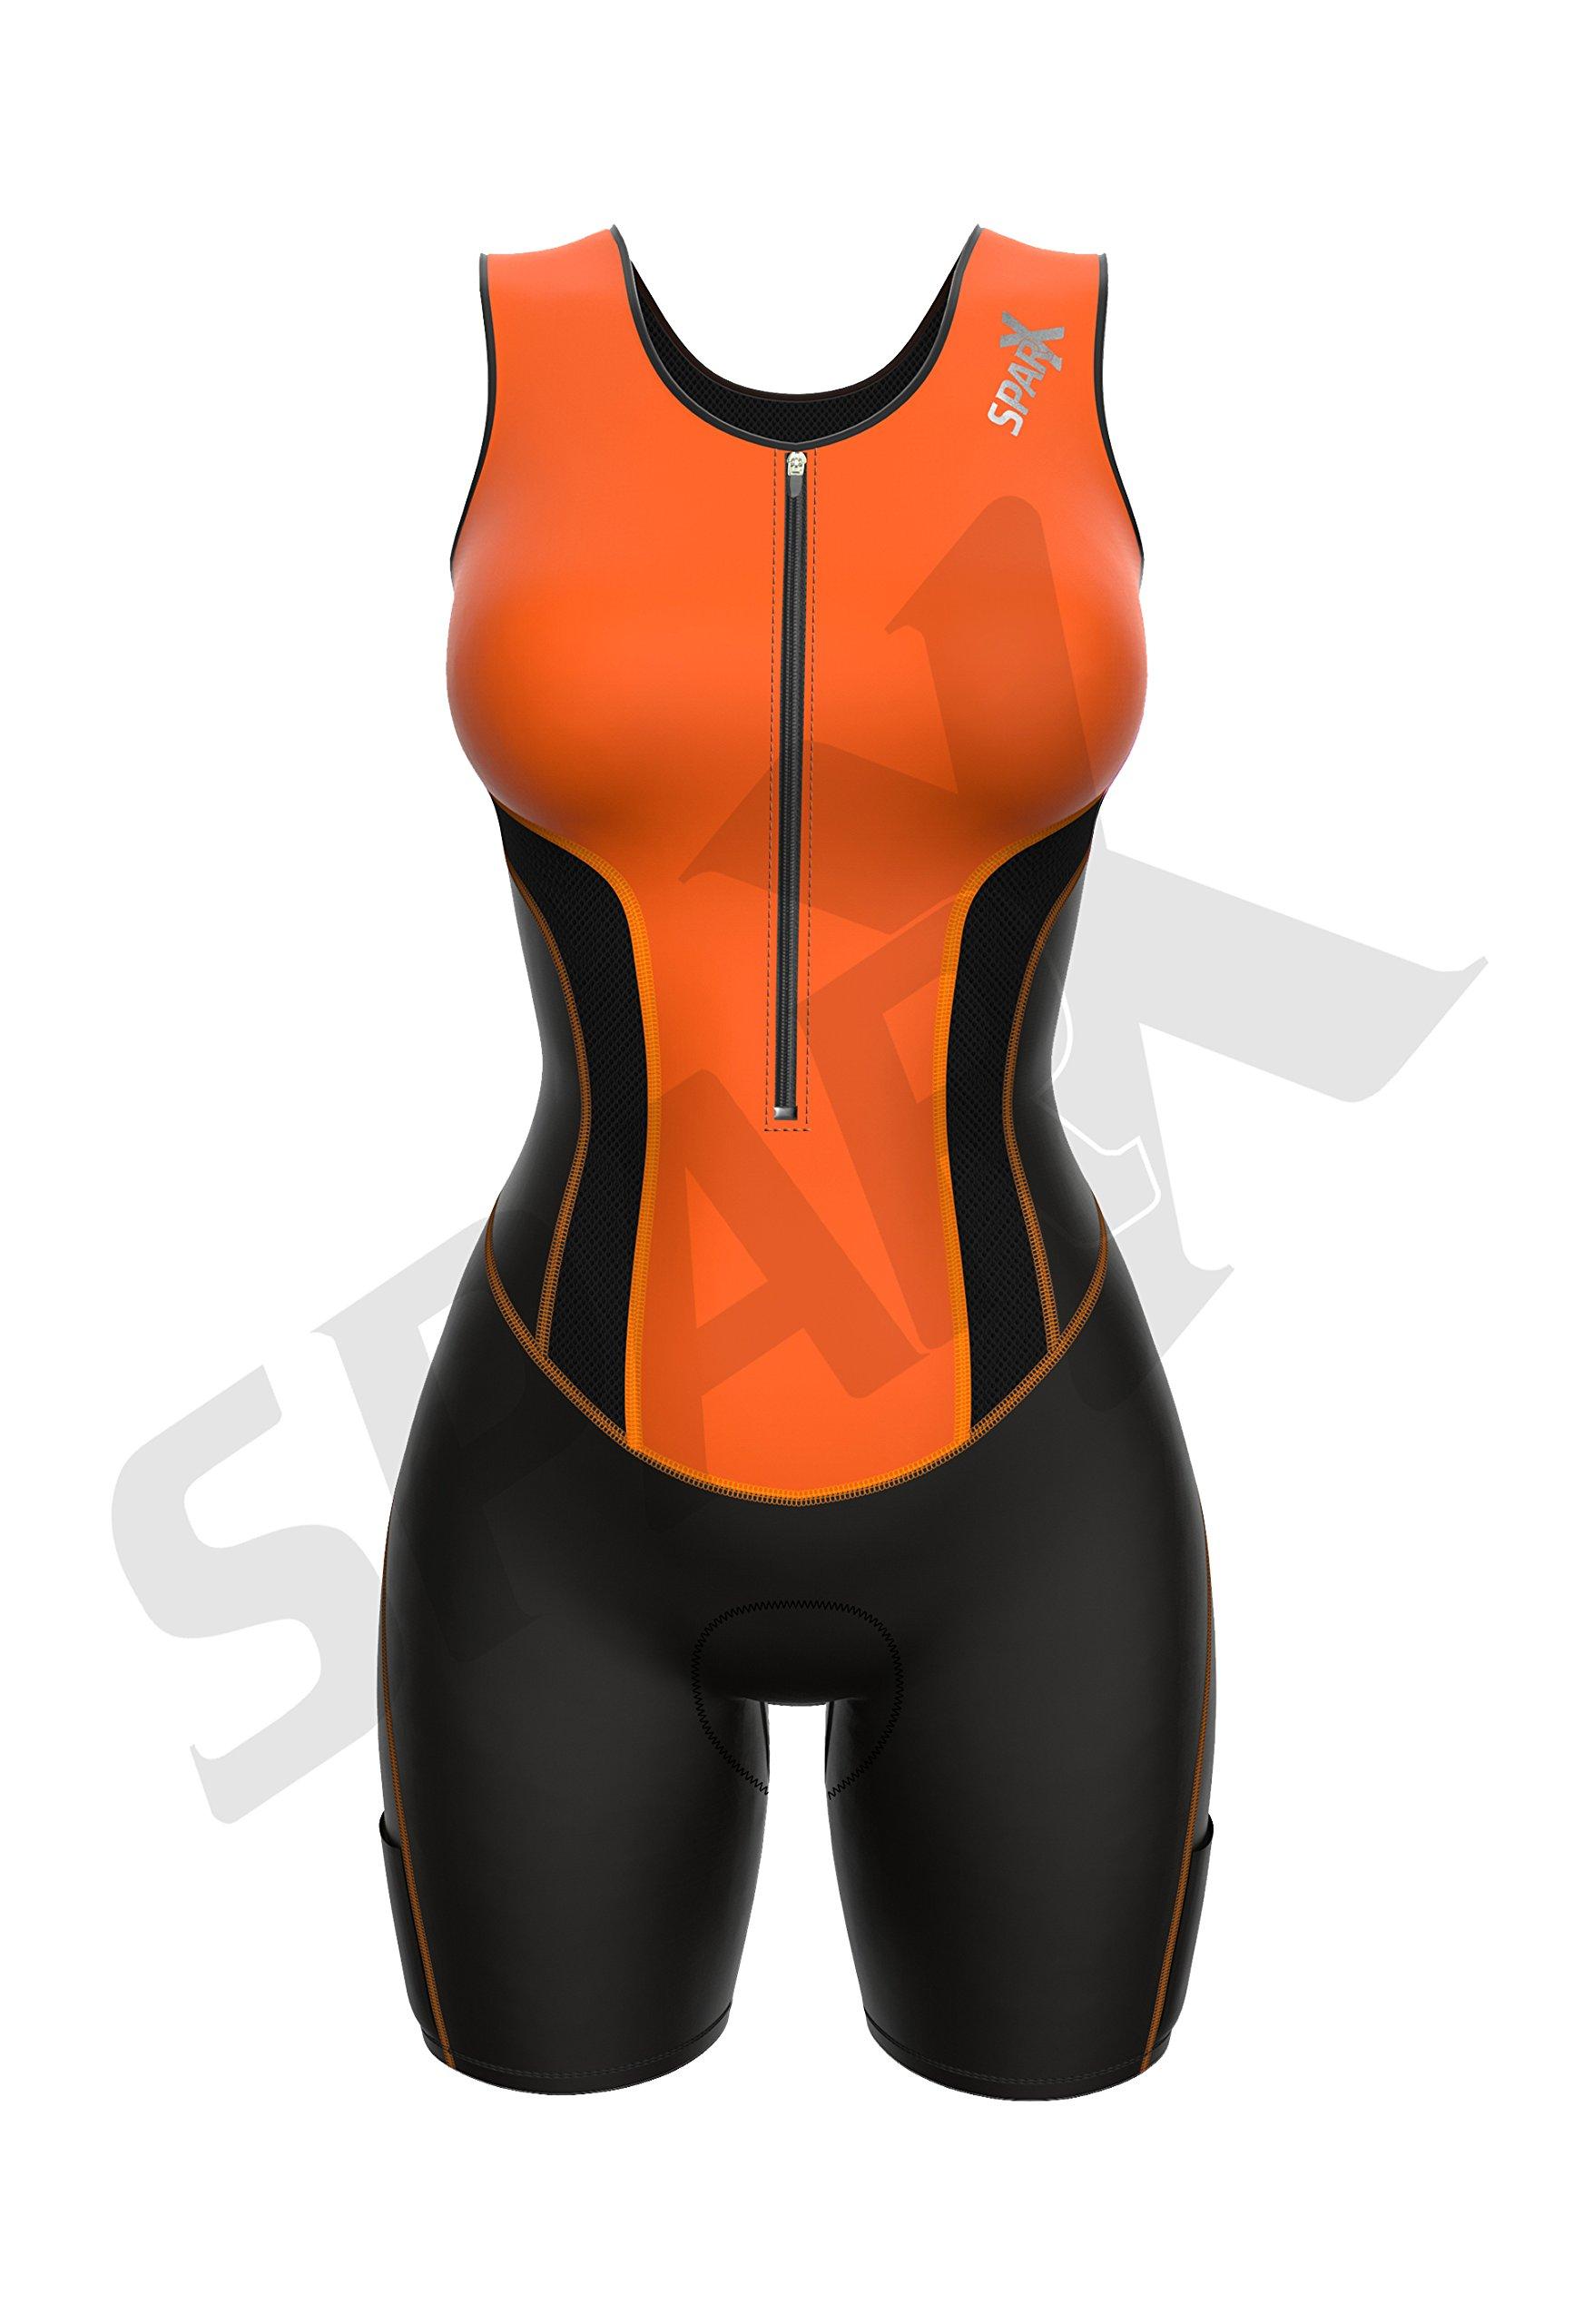 Sparx Women Triathlon Suit Tri Short Racing Cycling Swim Run (Small, Neon Orange) by Sparx Sports (Image #3)